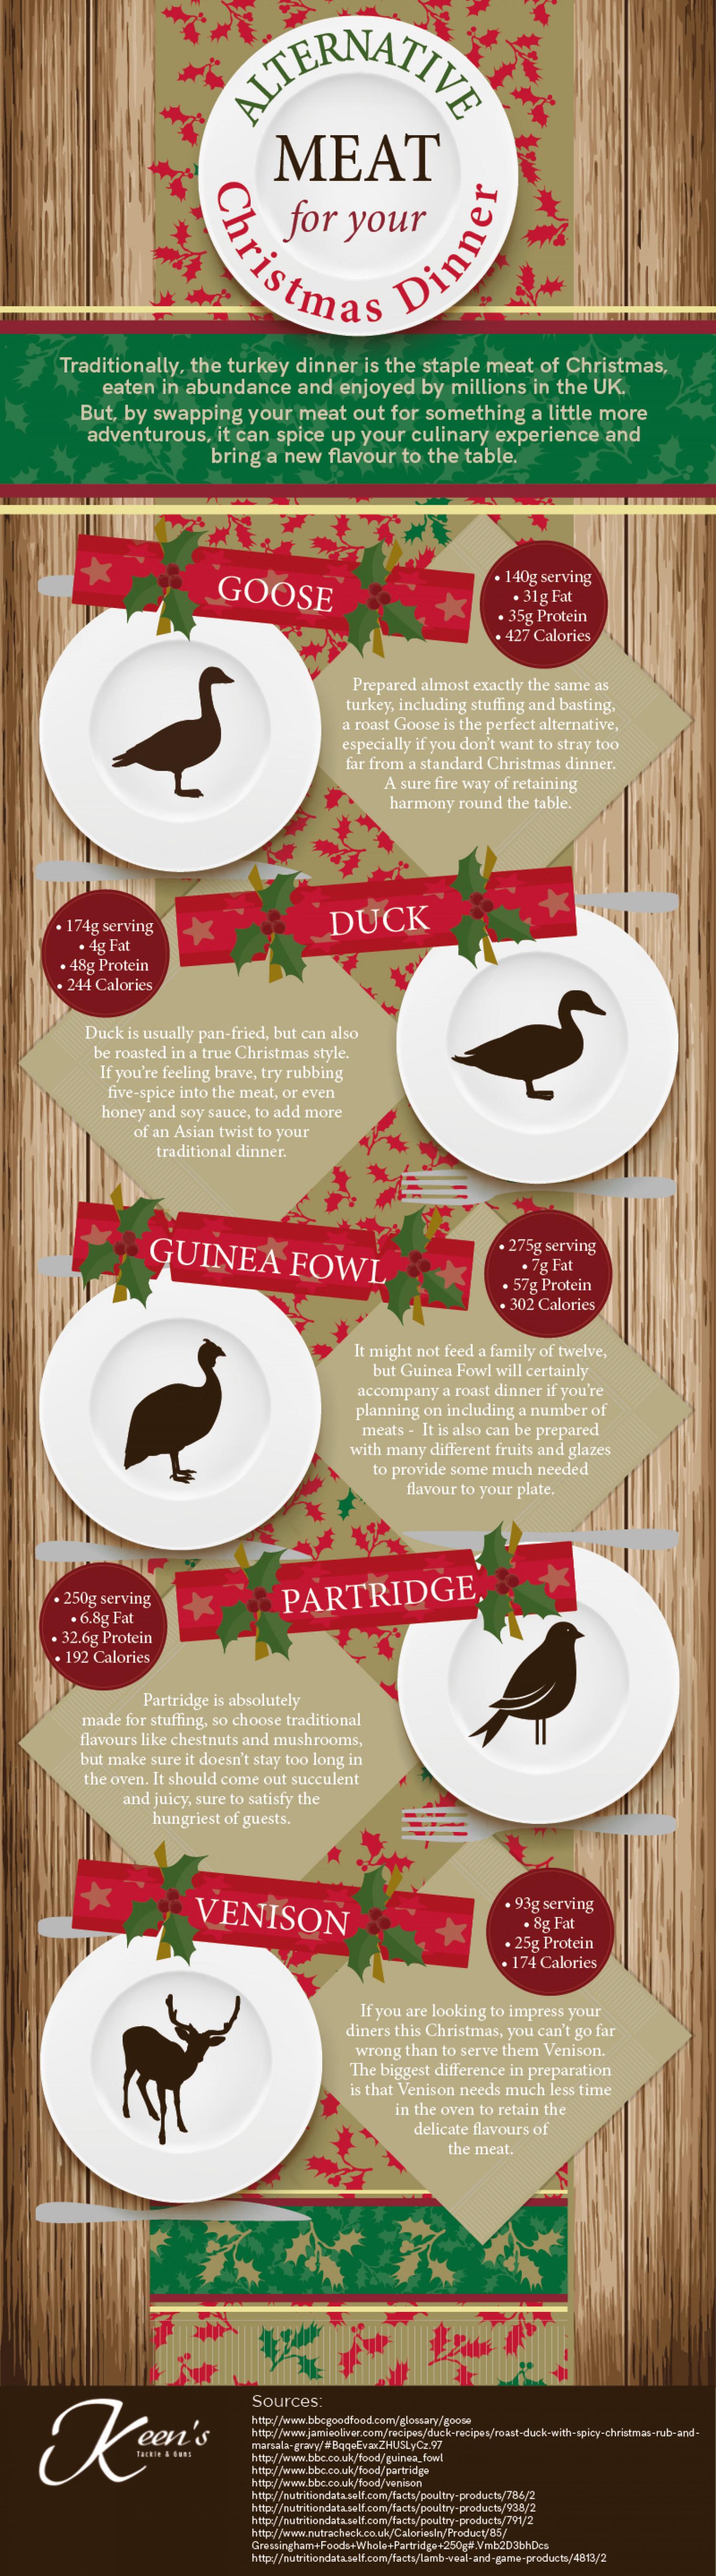 Alternative Meat for Your Christmas Dinner